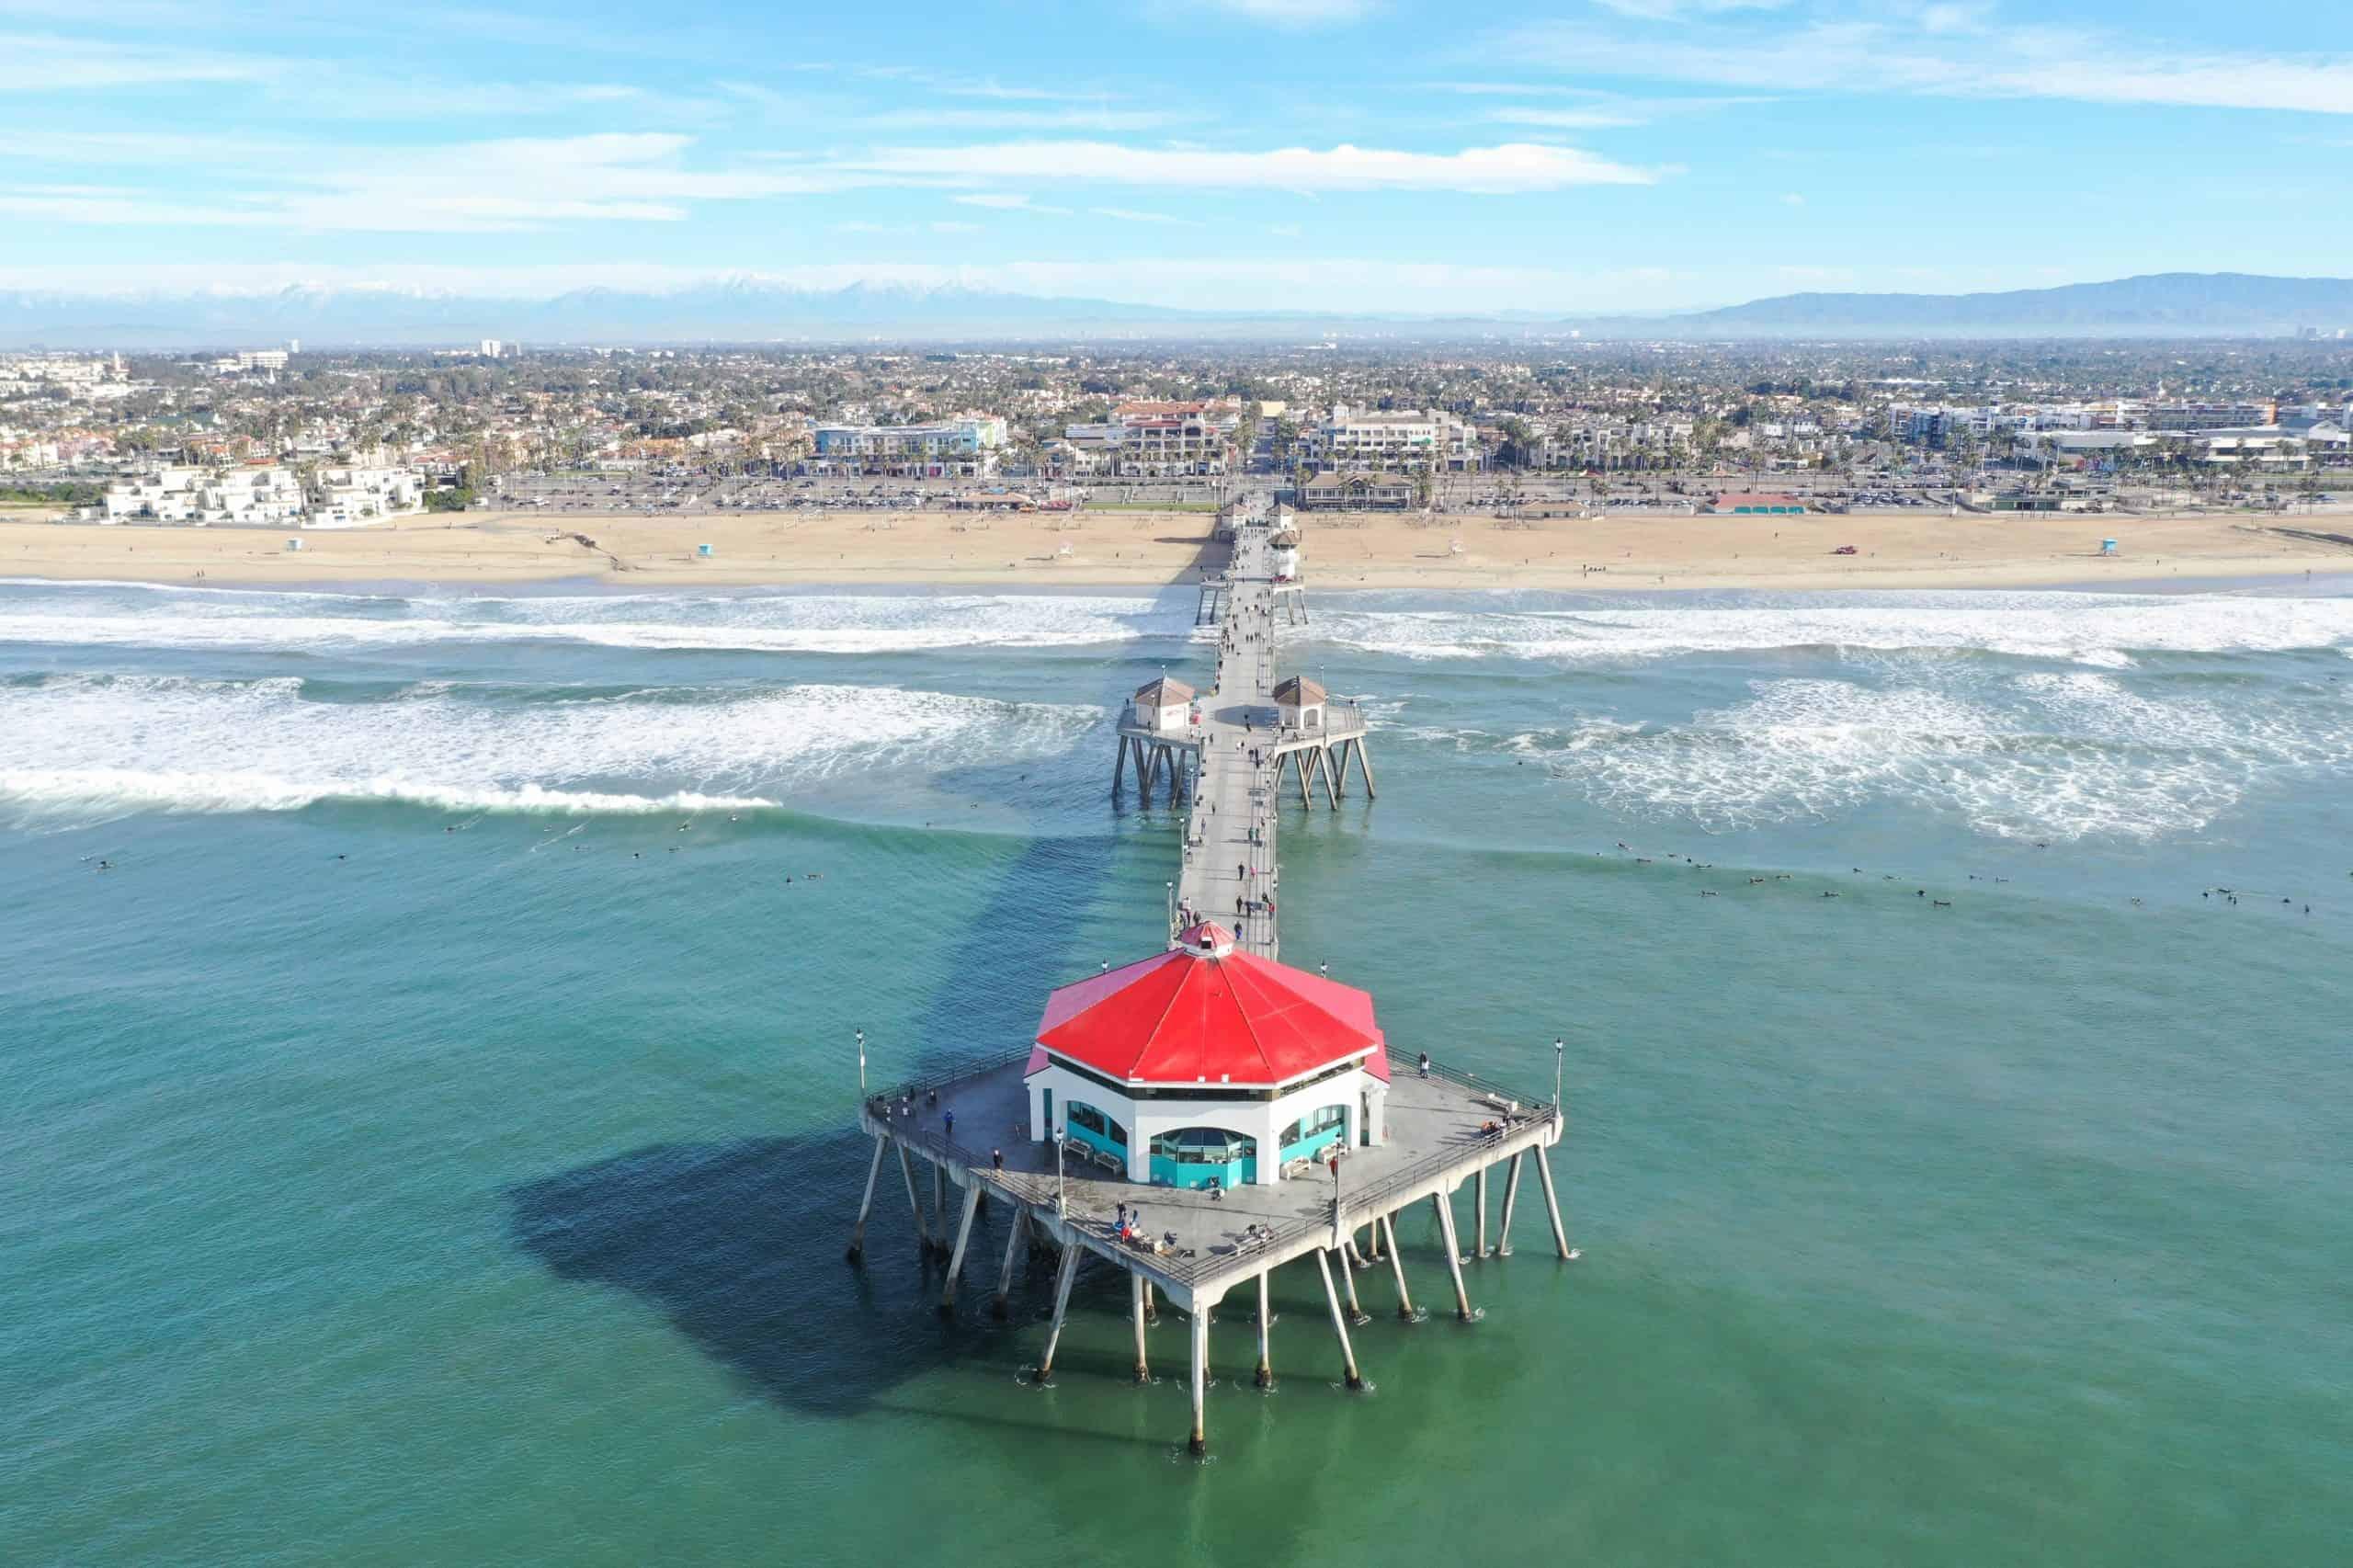 Huntington Beach in Southern California.